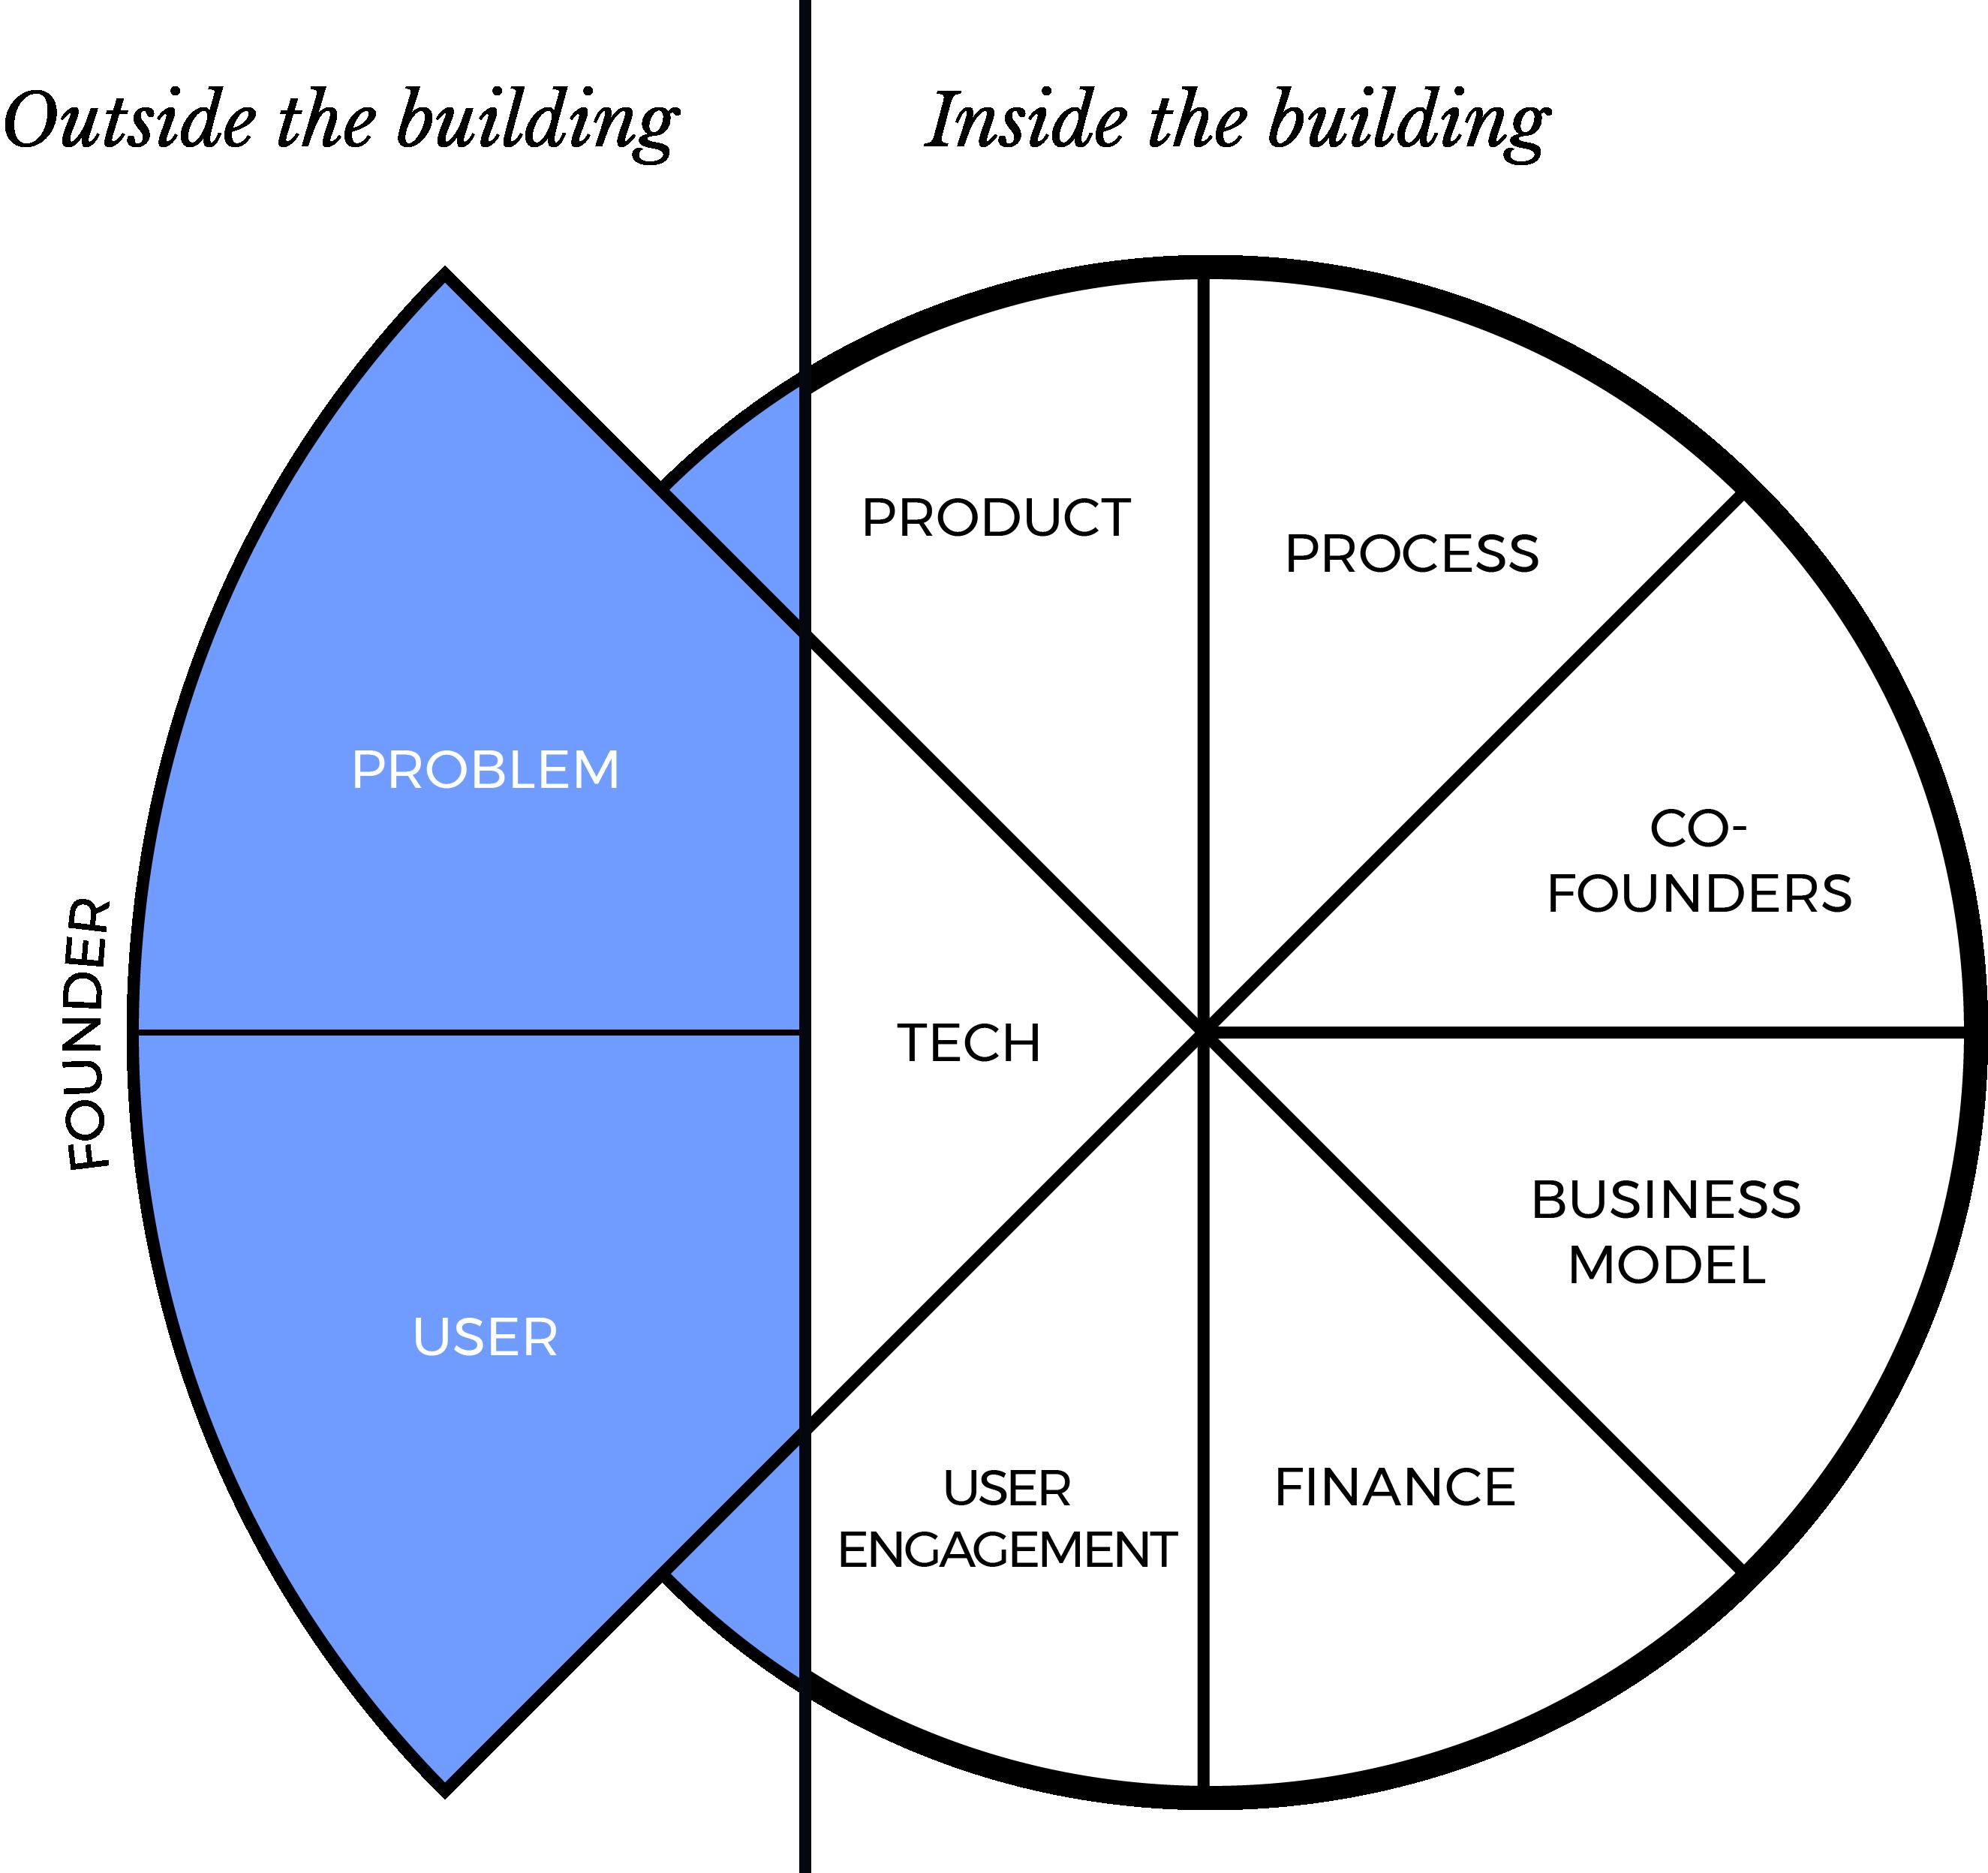 Nova process that your tech startup needs